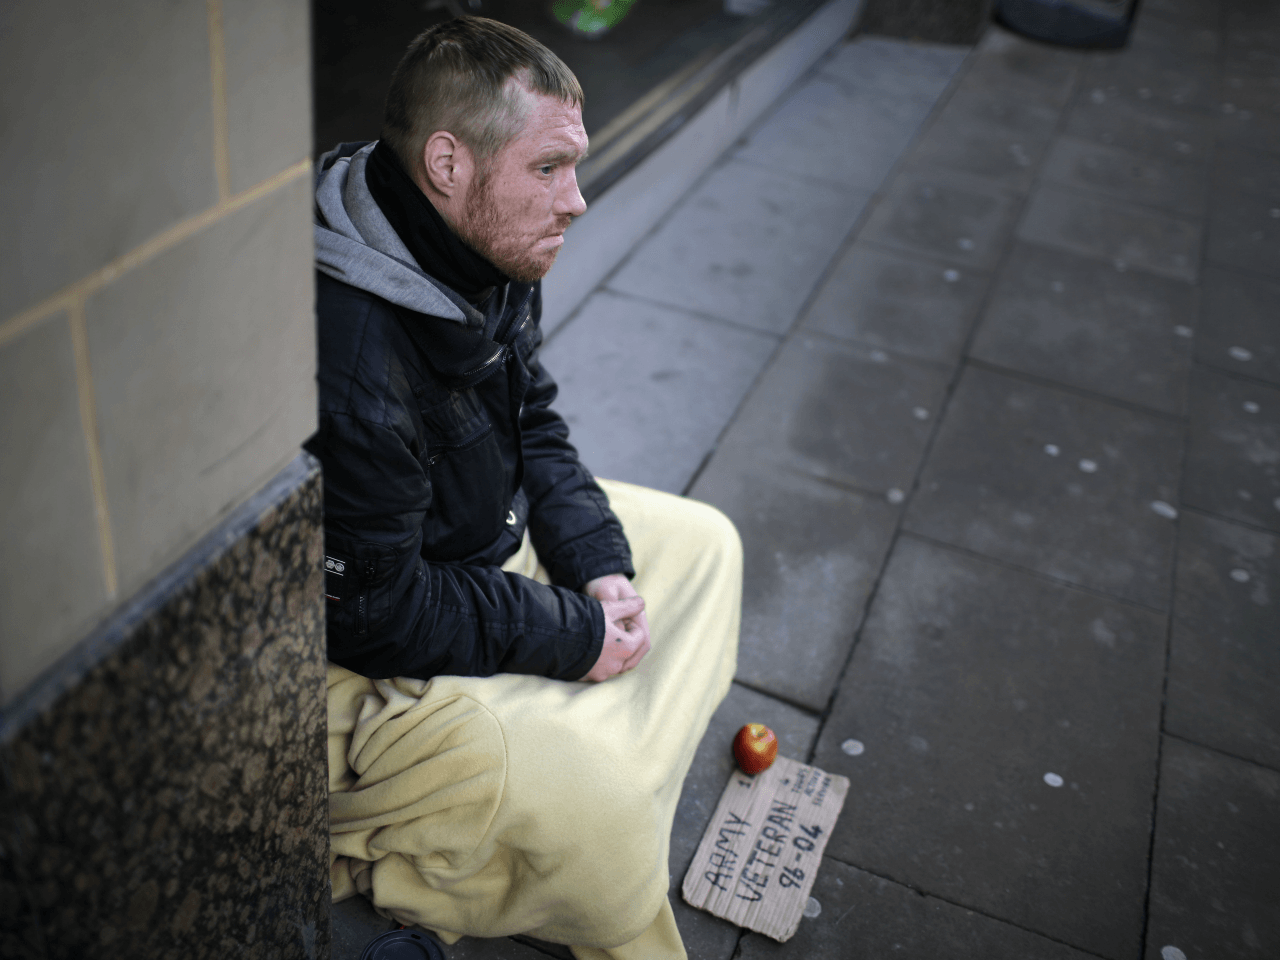 UKIP Blasts Local Authorities for 'Deliberately' Housing Migrants Before War Heroes - Breitbart